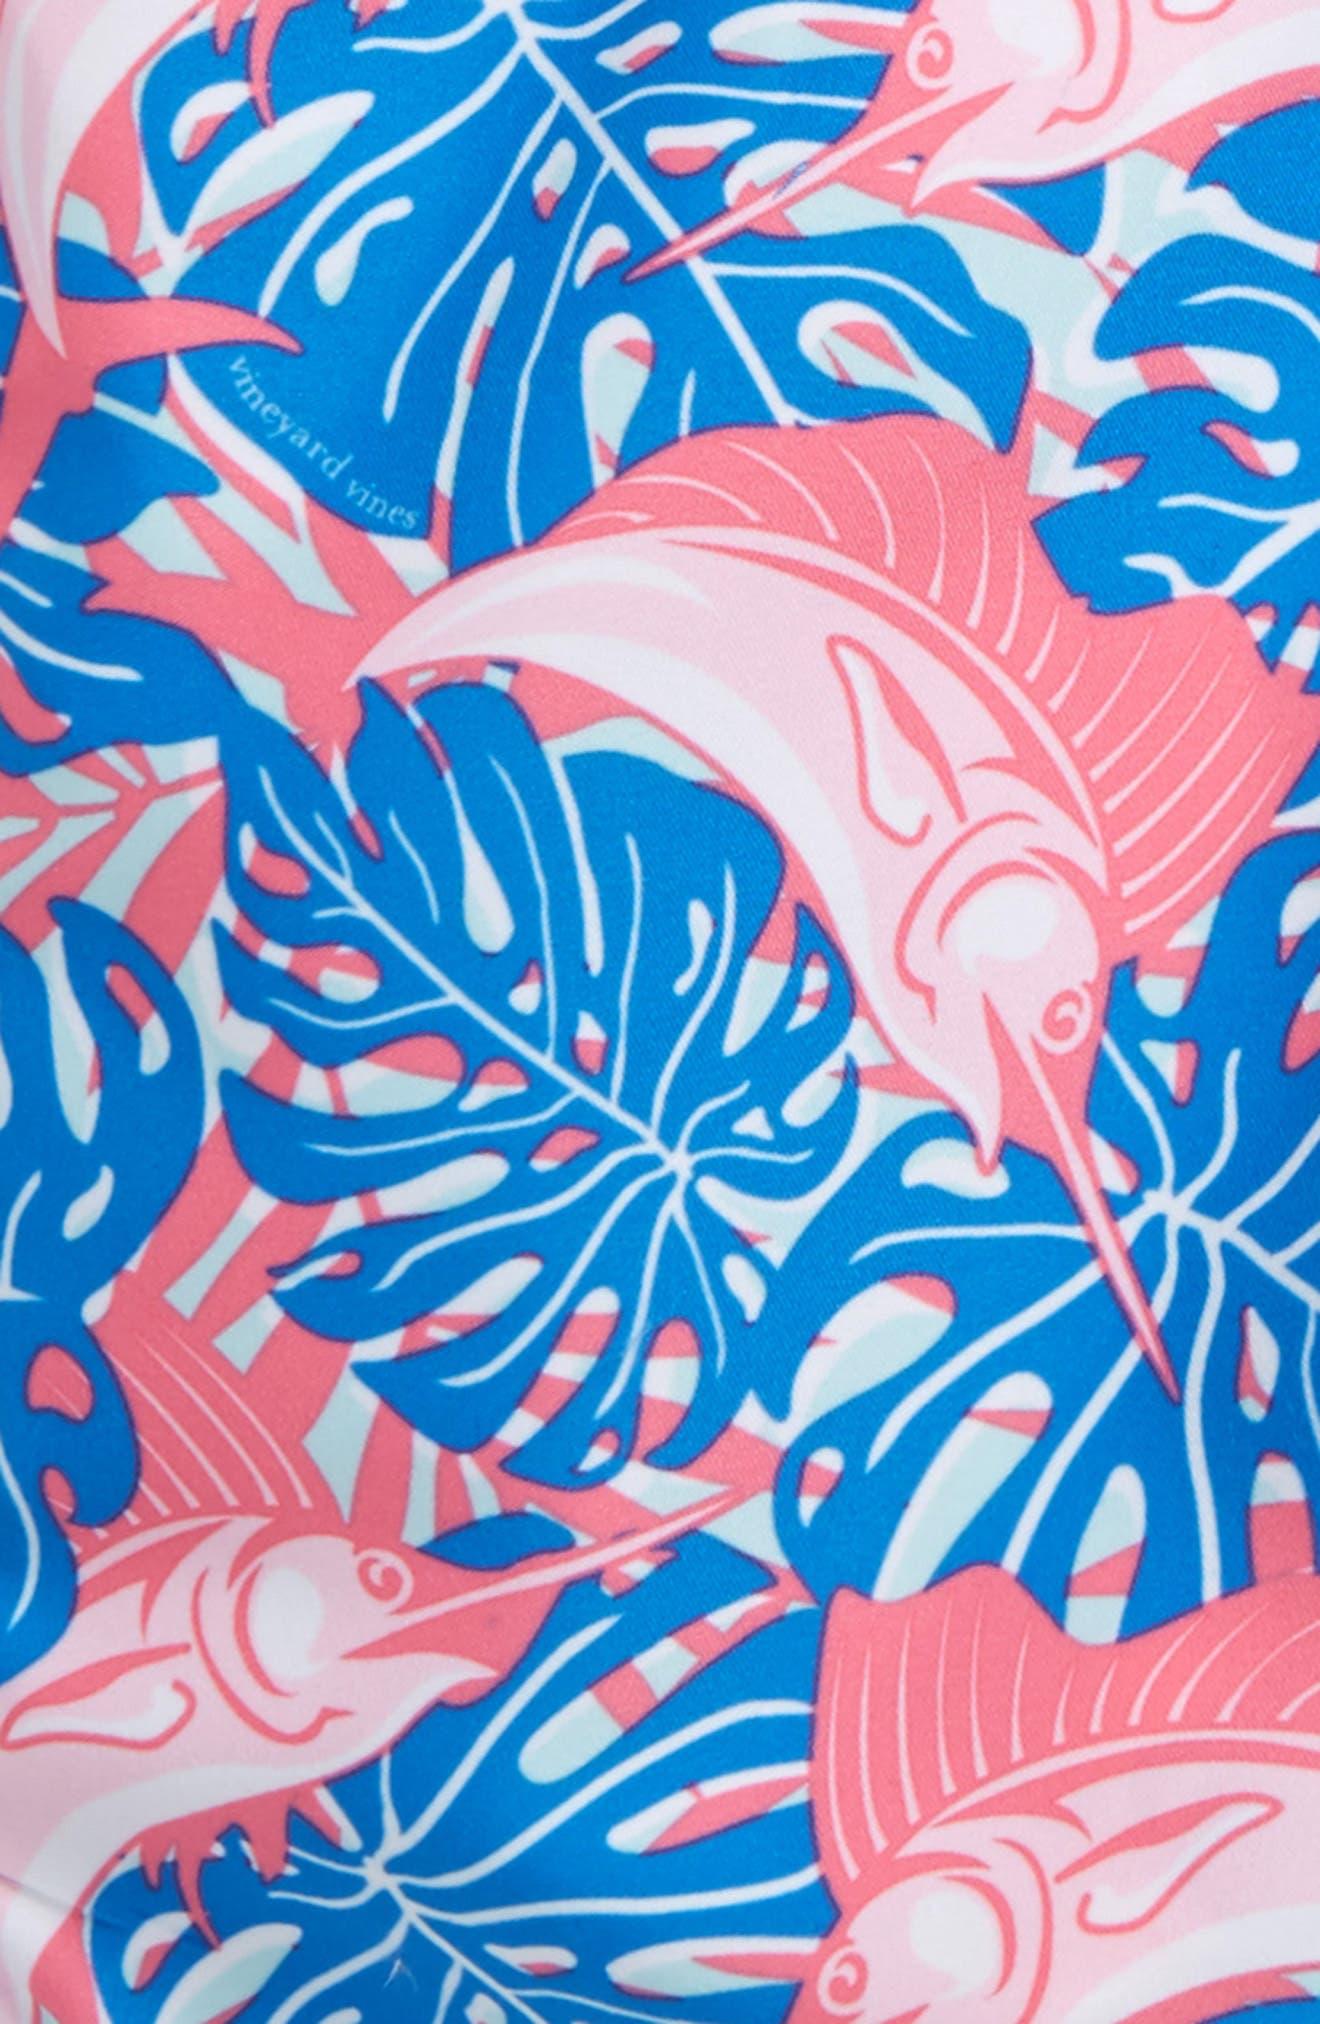 Chappy Sailfish & Leaves Swim Trunks,                             Alternate thumbnail 2, color,                             Azure Blue